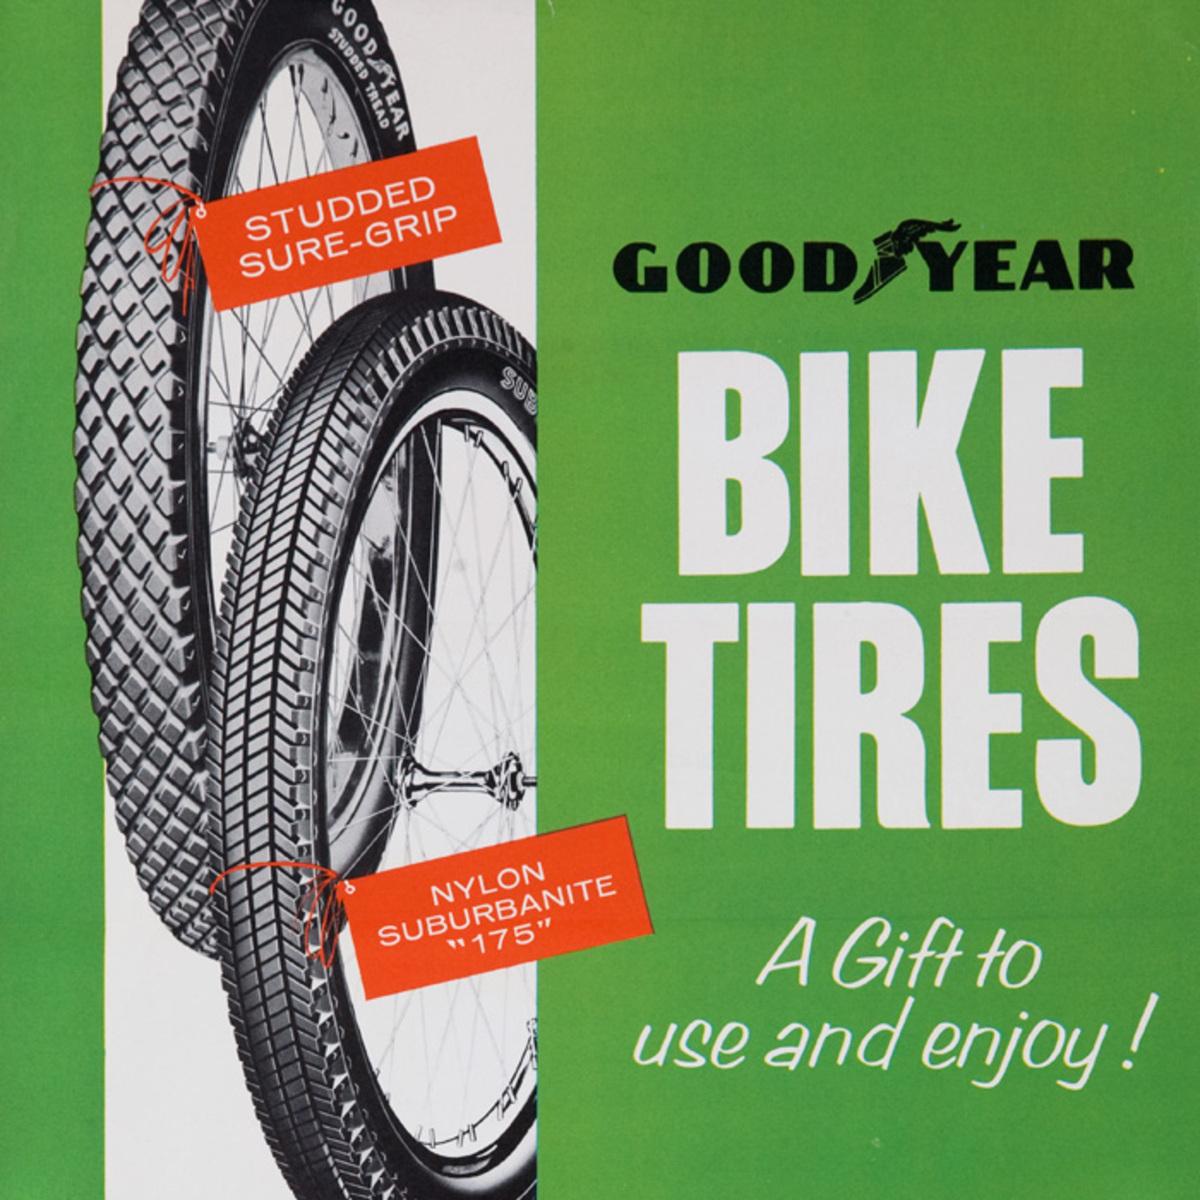 GoodYear Biek Tires Original American 1950s Bicycle Shop Poster